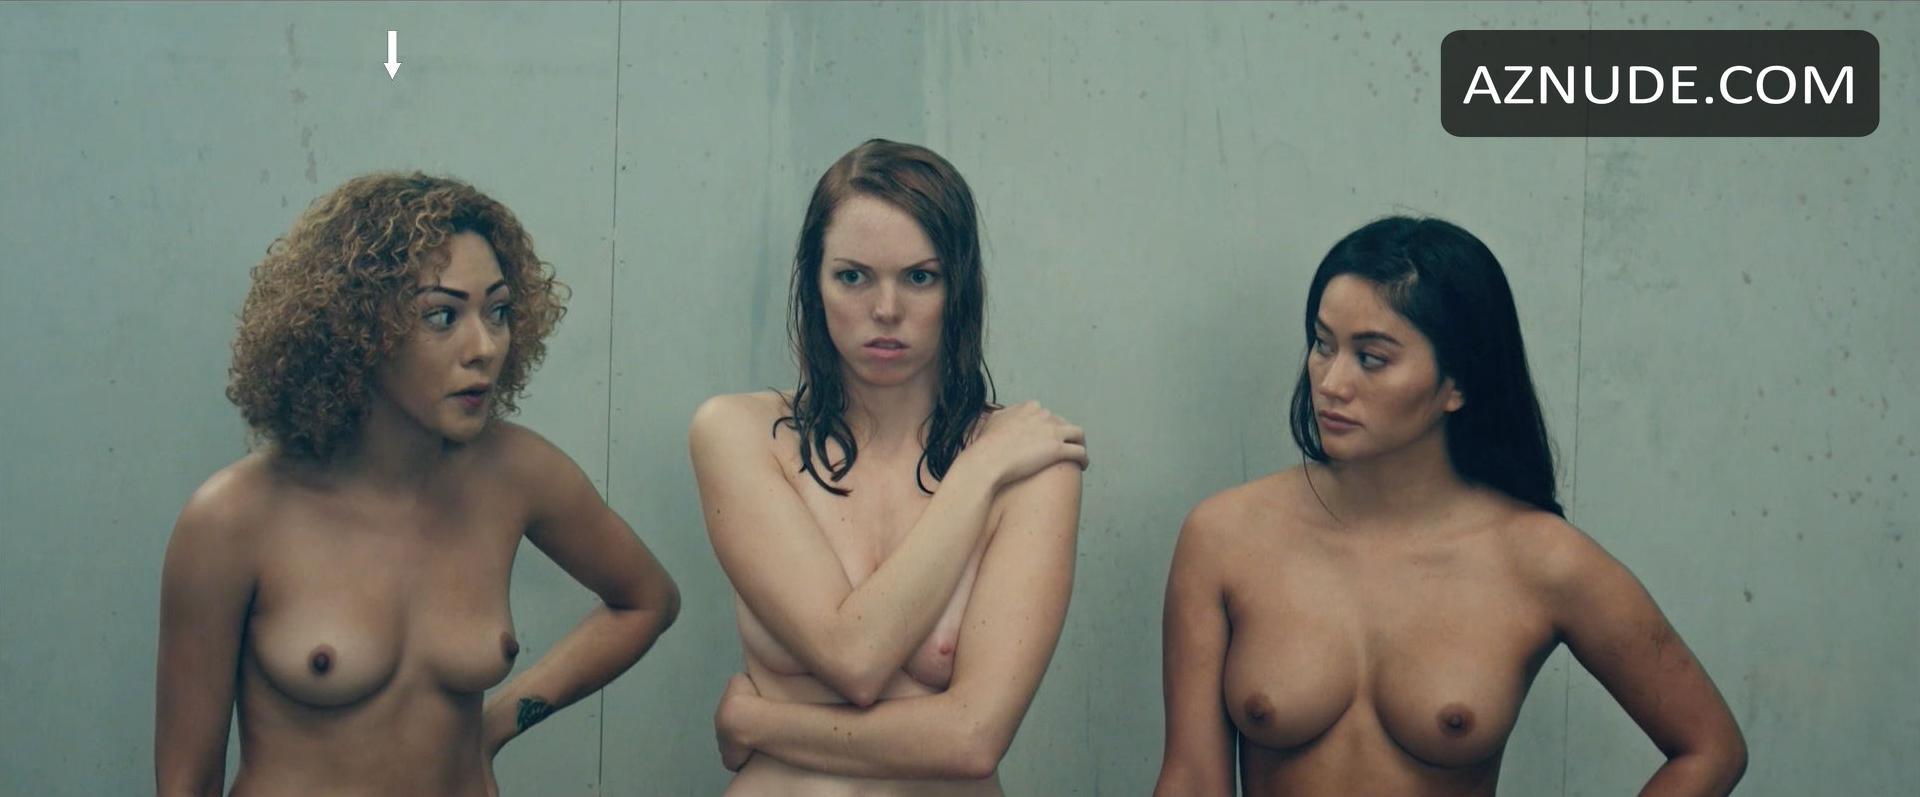 Amazon Nude Pic amazon hot box nude scenes - aznude